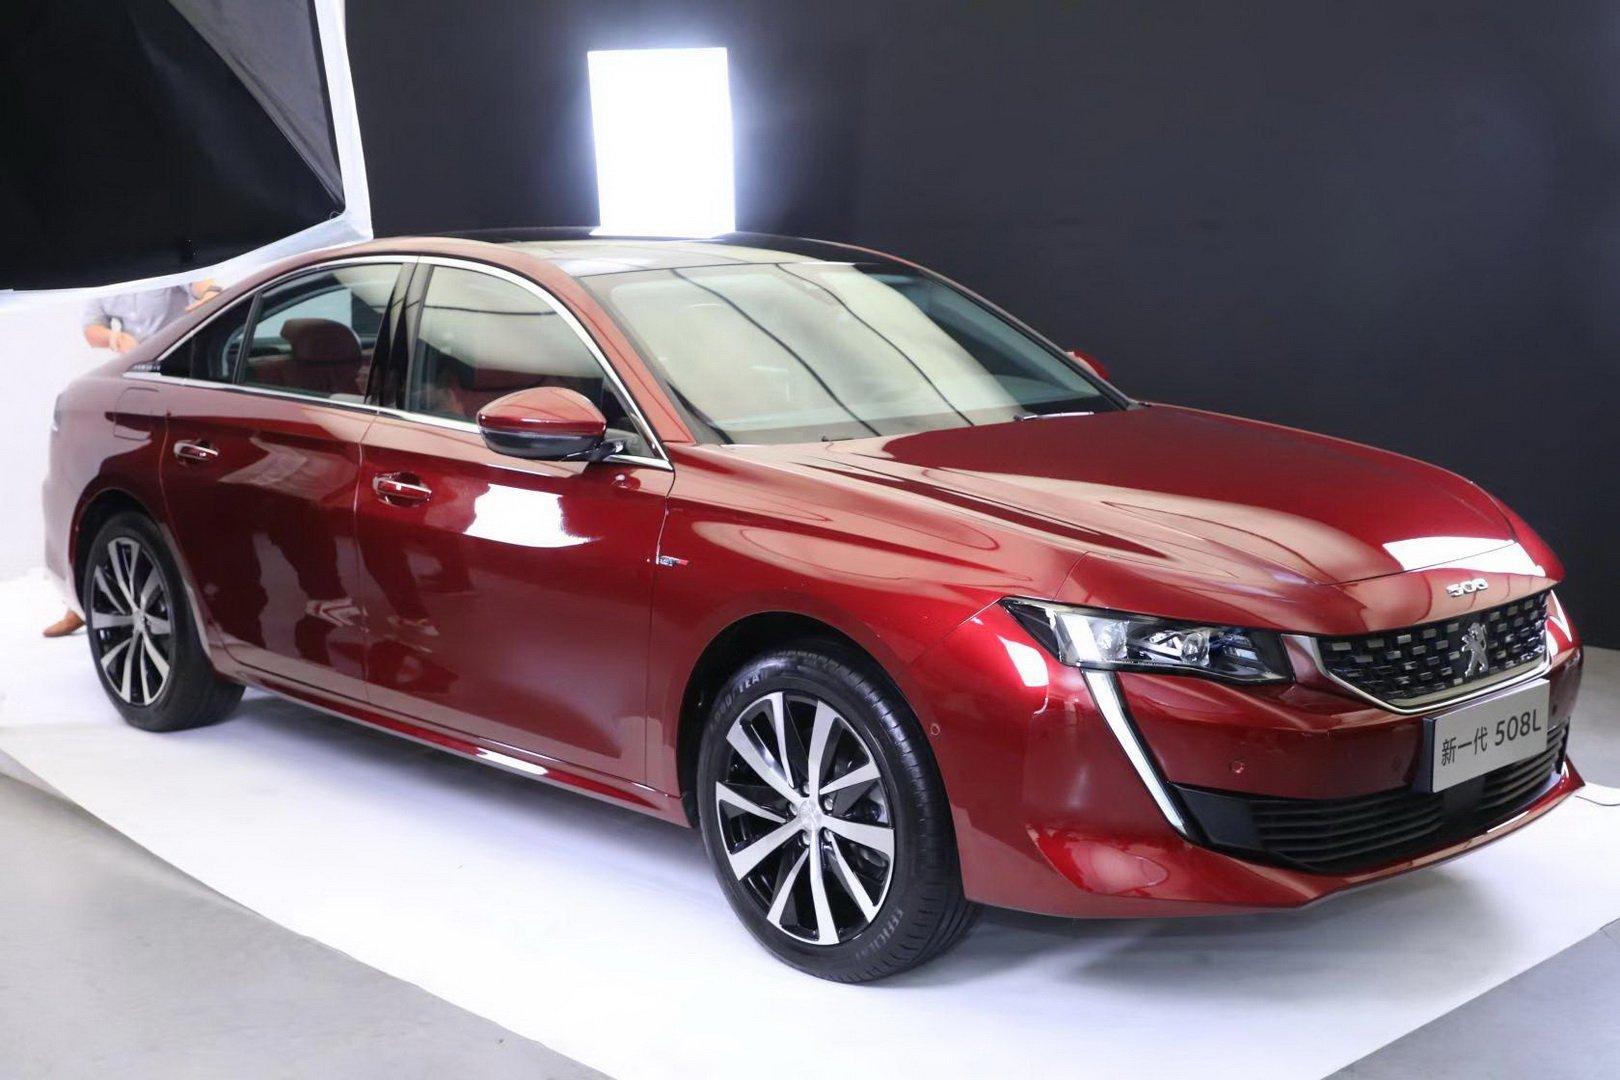 Peugeot 508L 2019 (4)